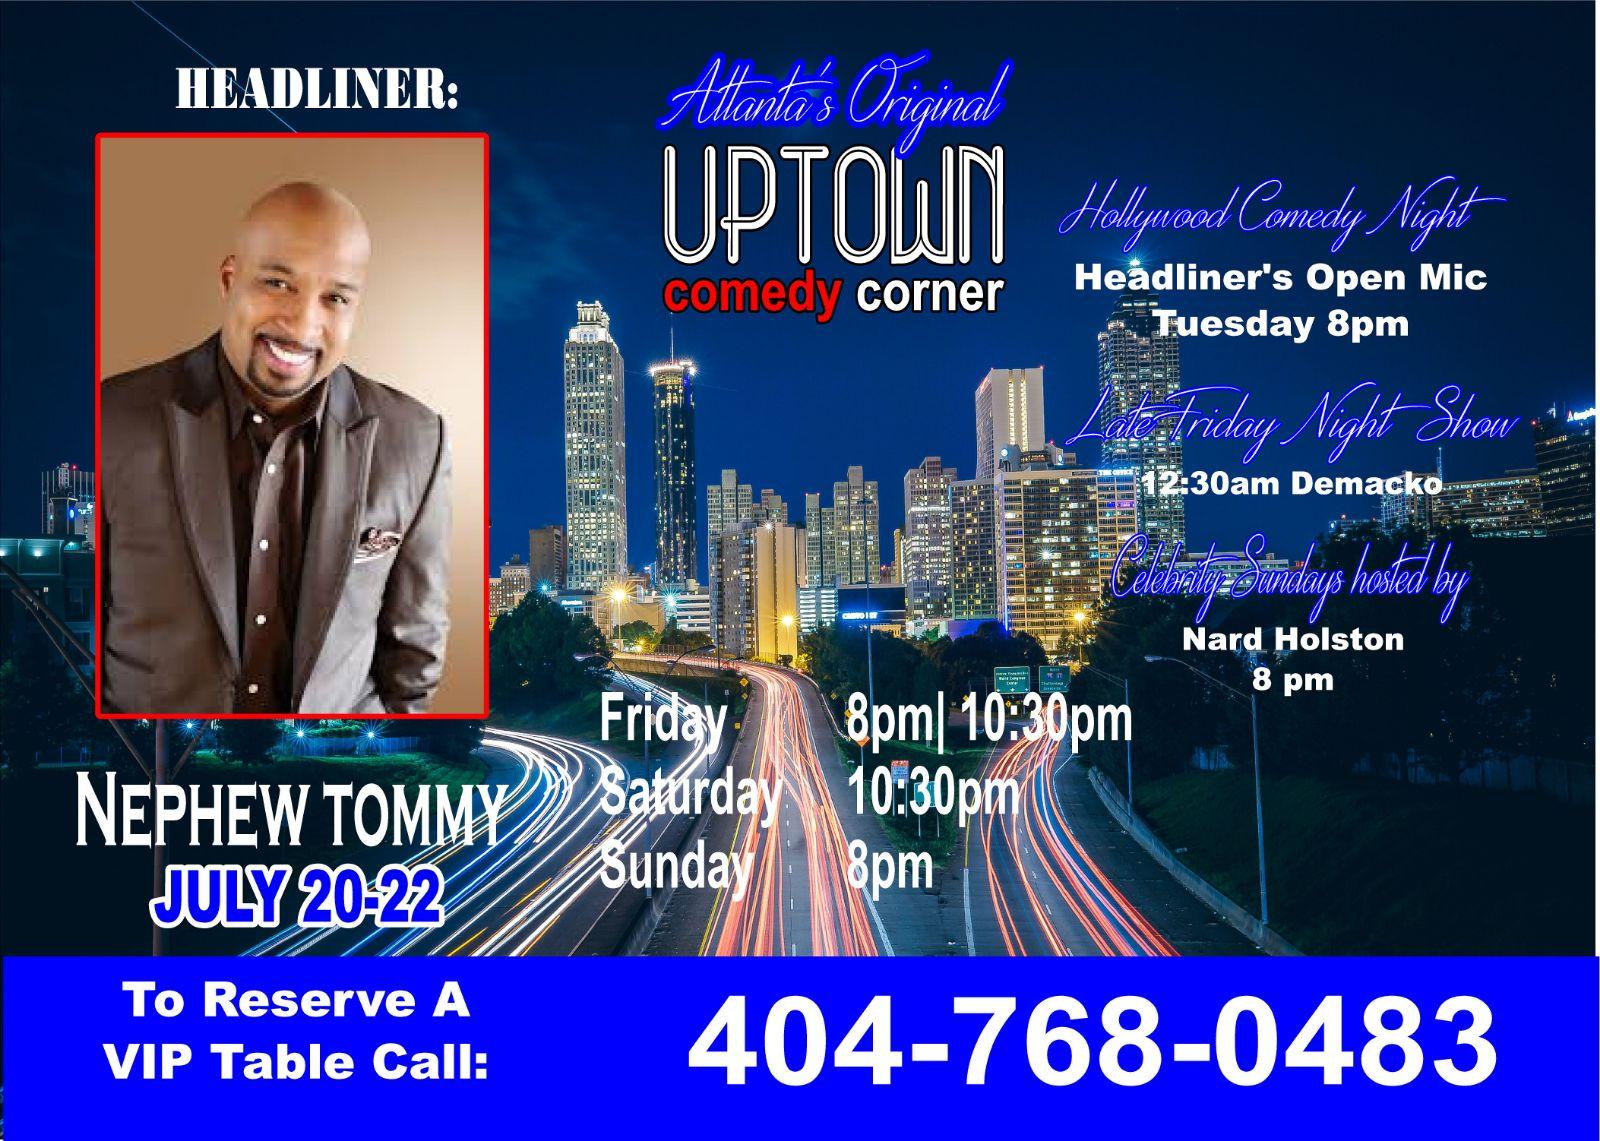 Uptown Comedy Corner Presents: Nephew Tommy